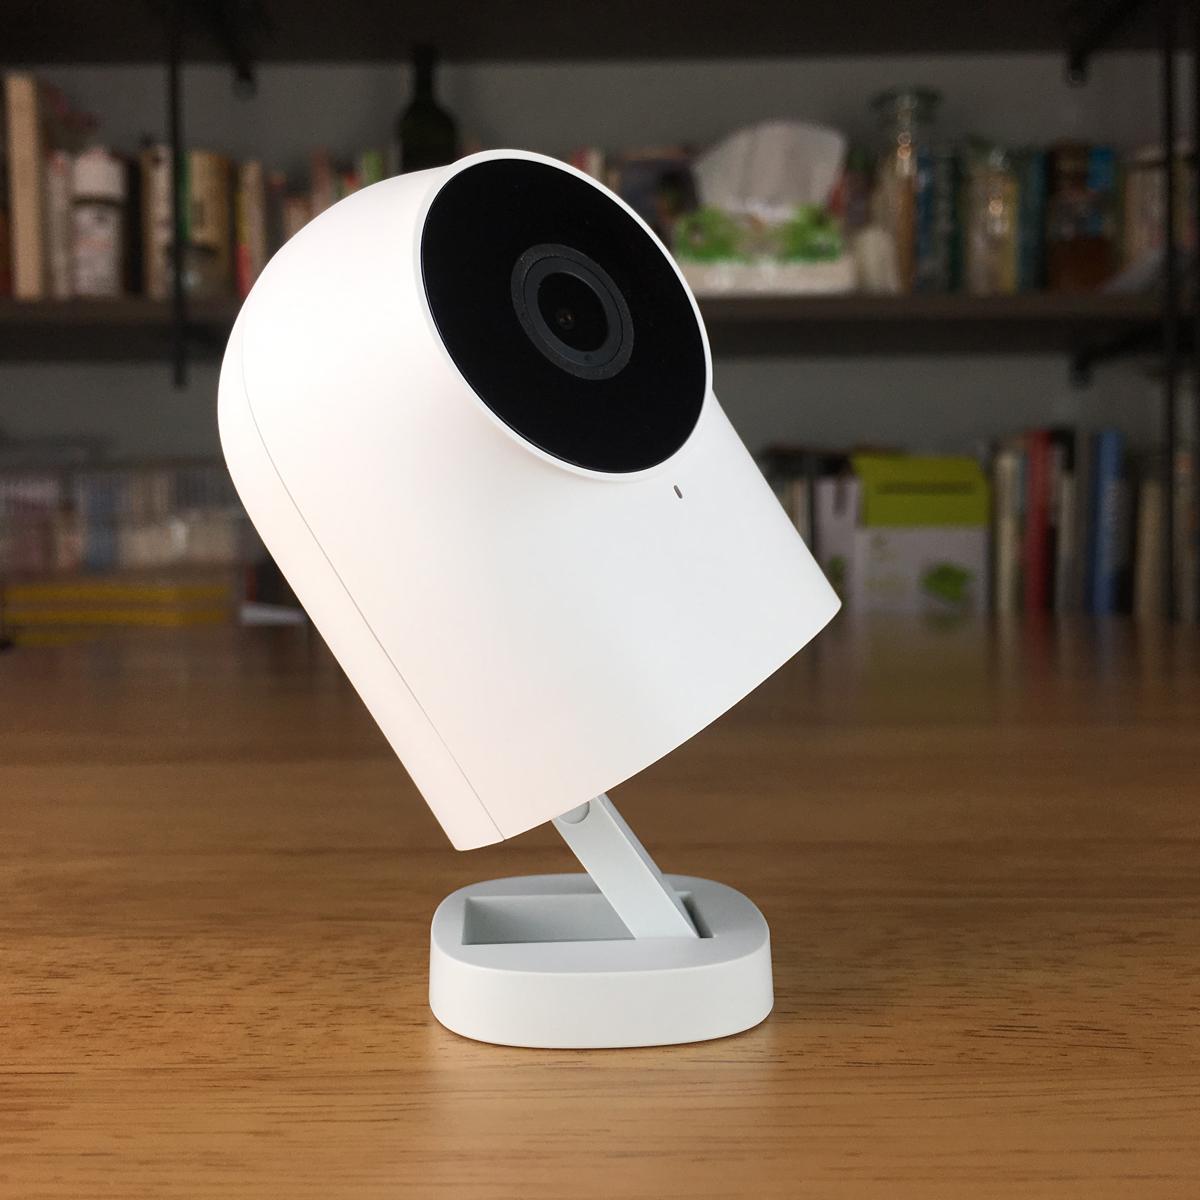 Aqara G2 Smart Hub Camera (review) – Homekit News and Reviews